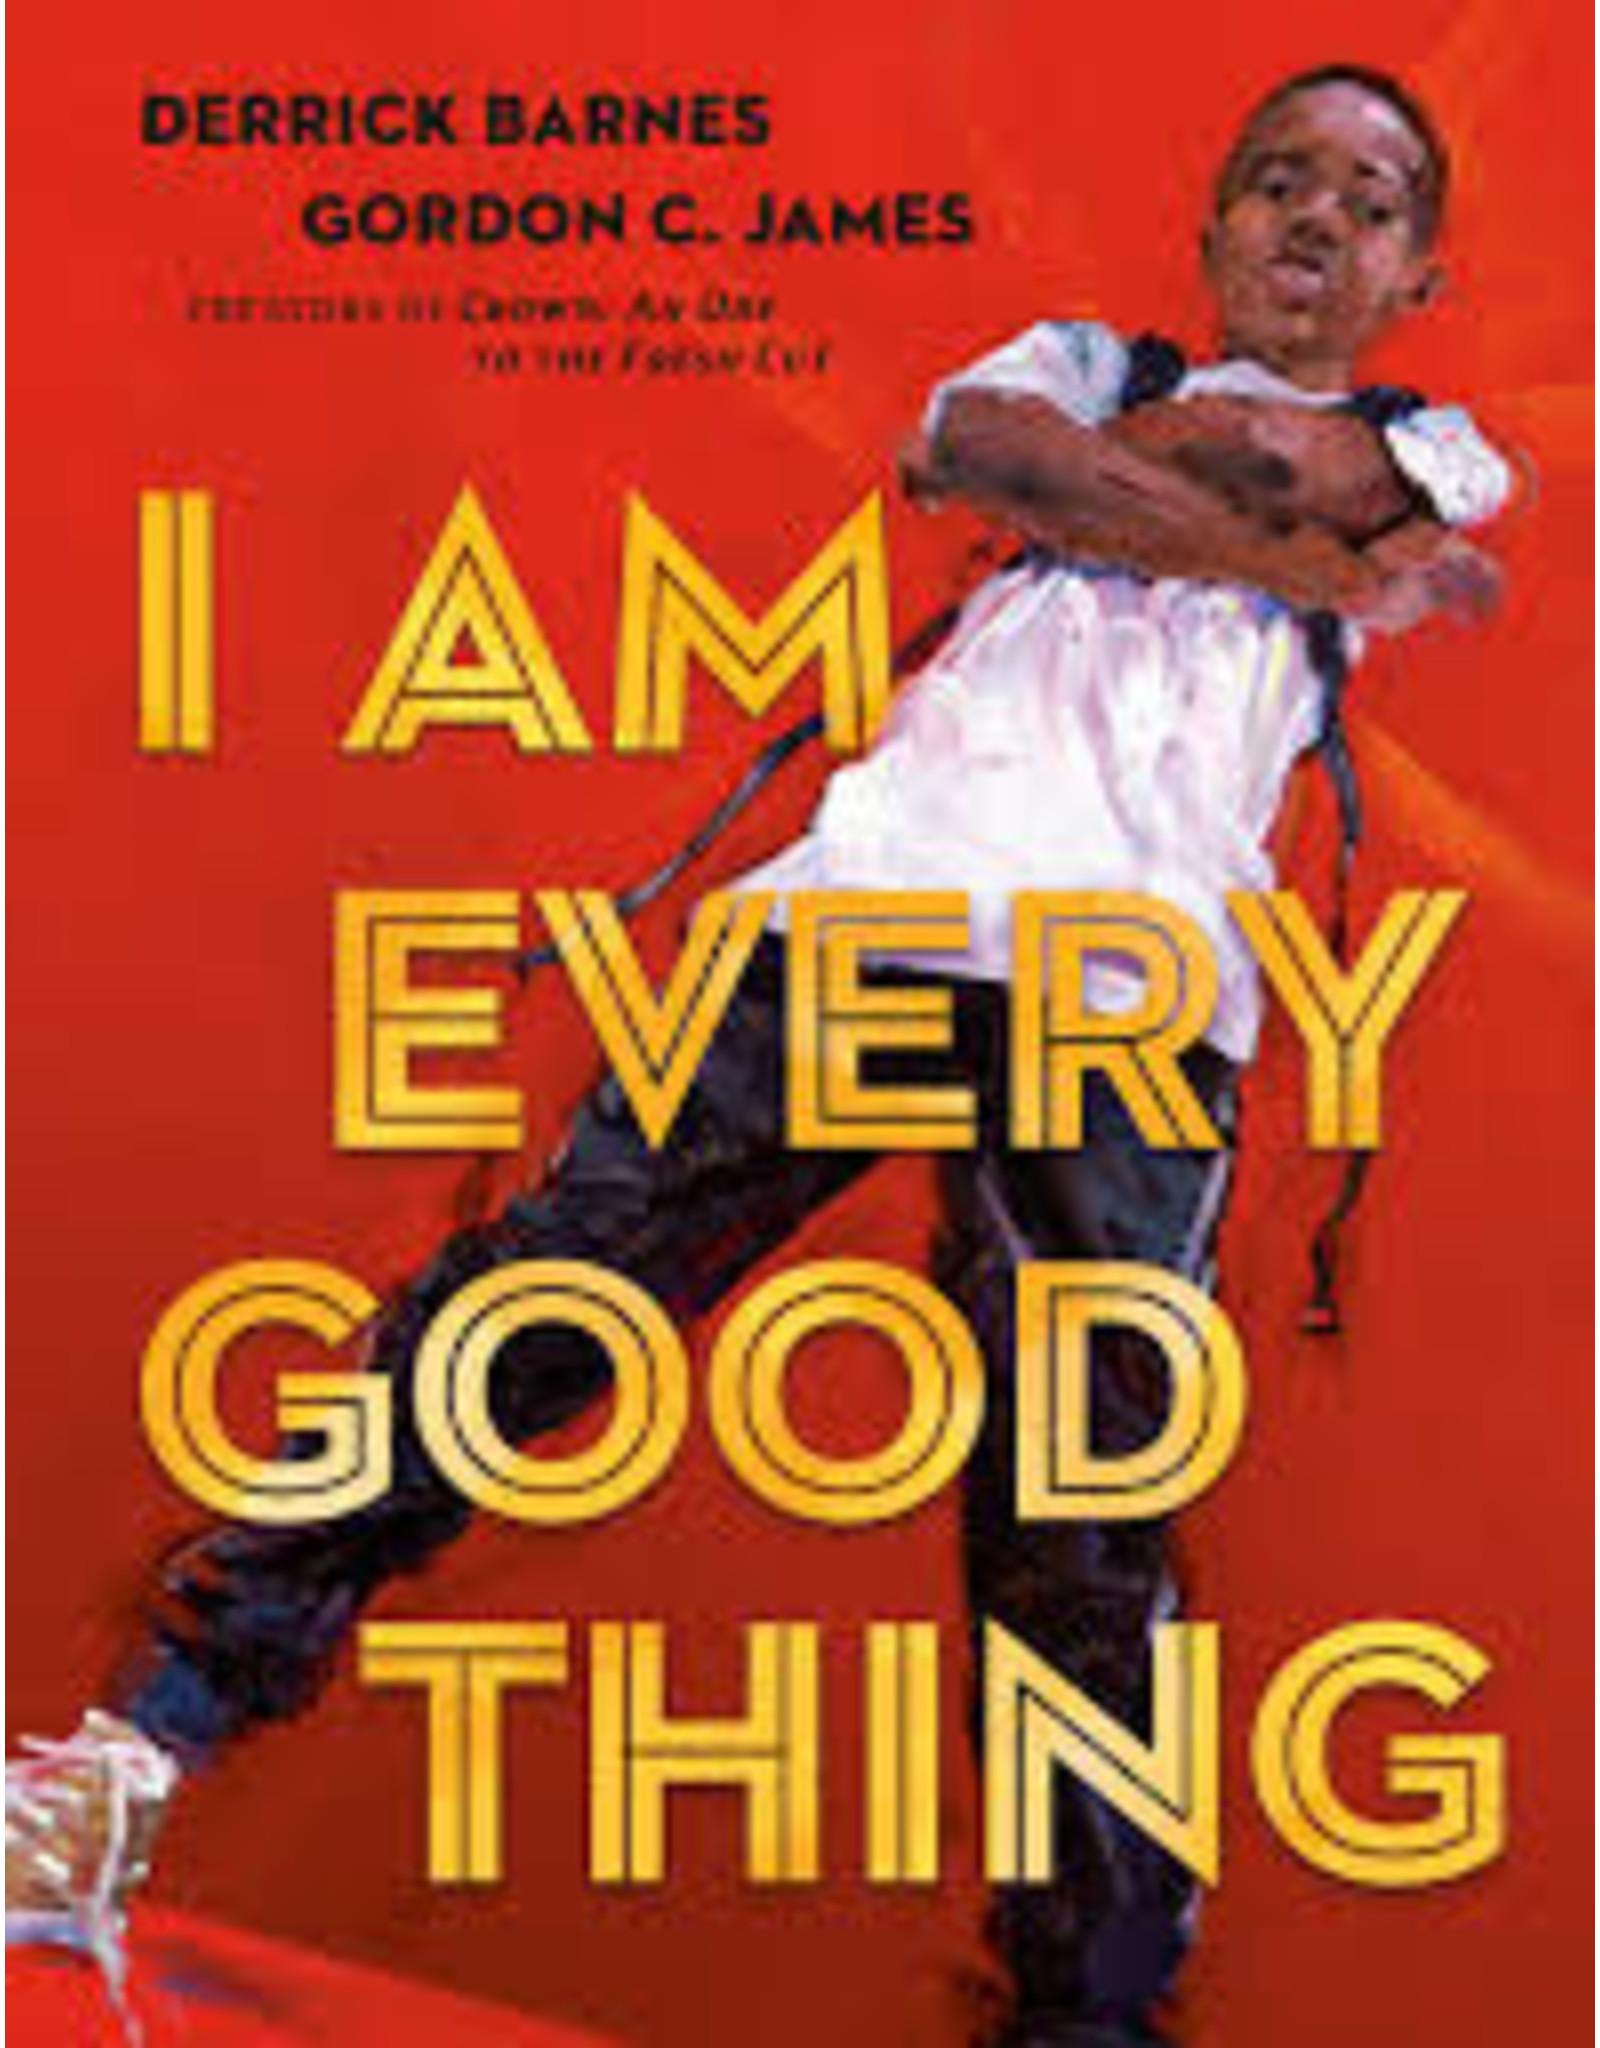 Books I Am Every Good Thing by Derrick Barnes & Gordon C.James